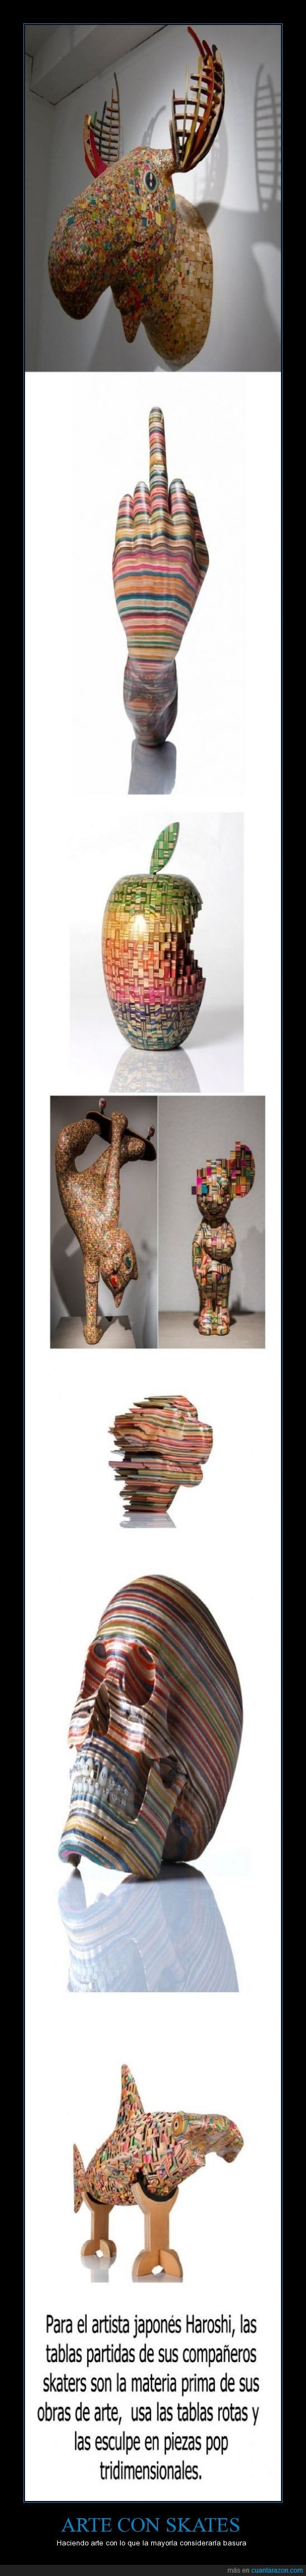 arte,calavera,escultura,haroshi,partida,partir,pieza,skate,skaters,tabla